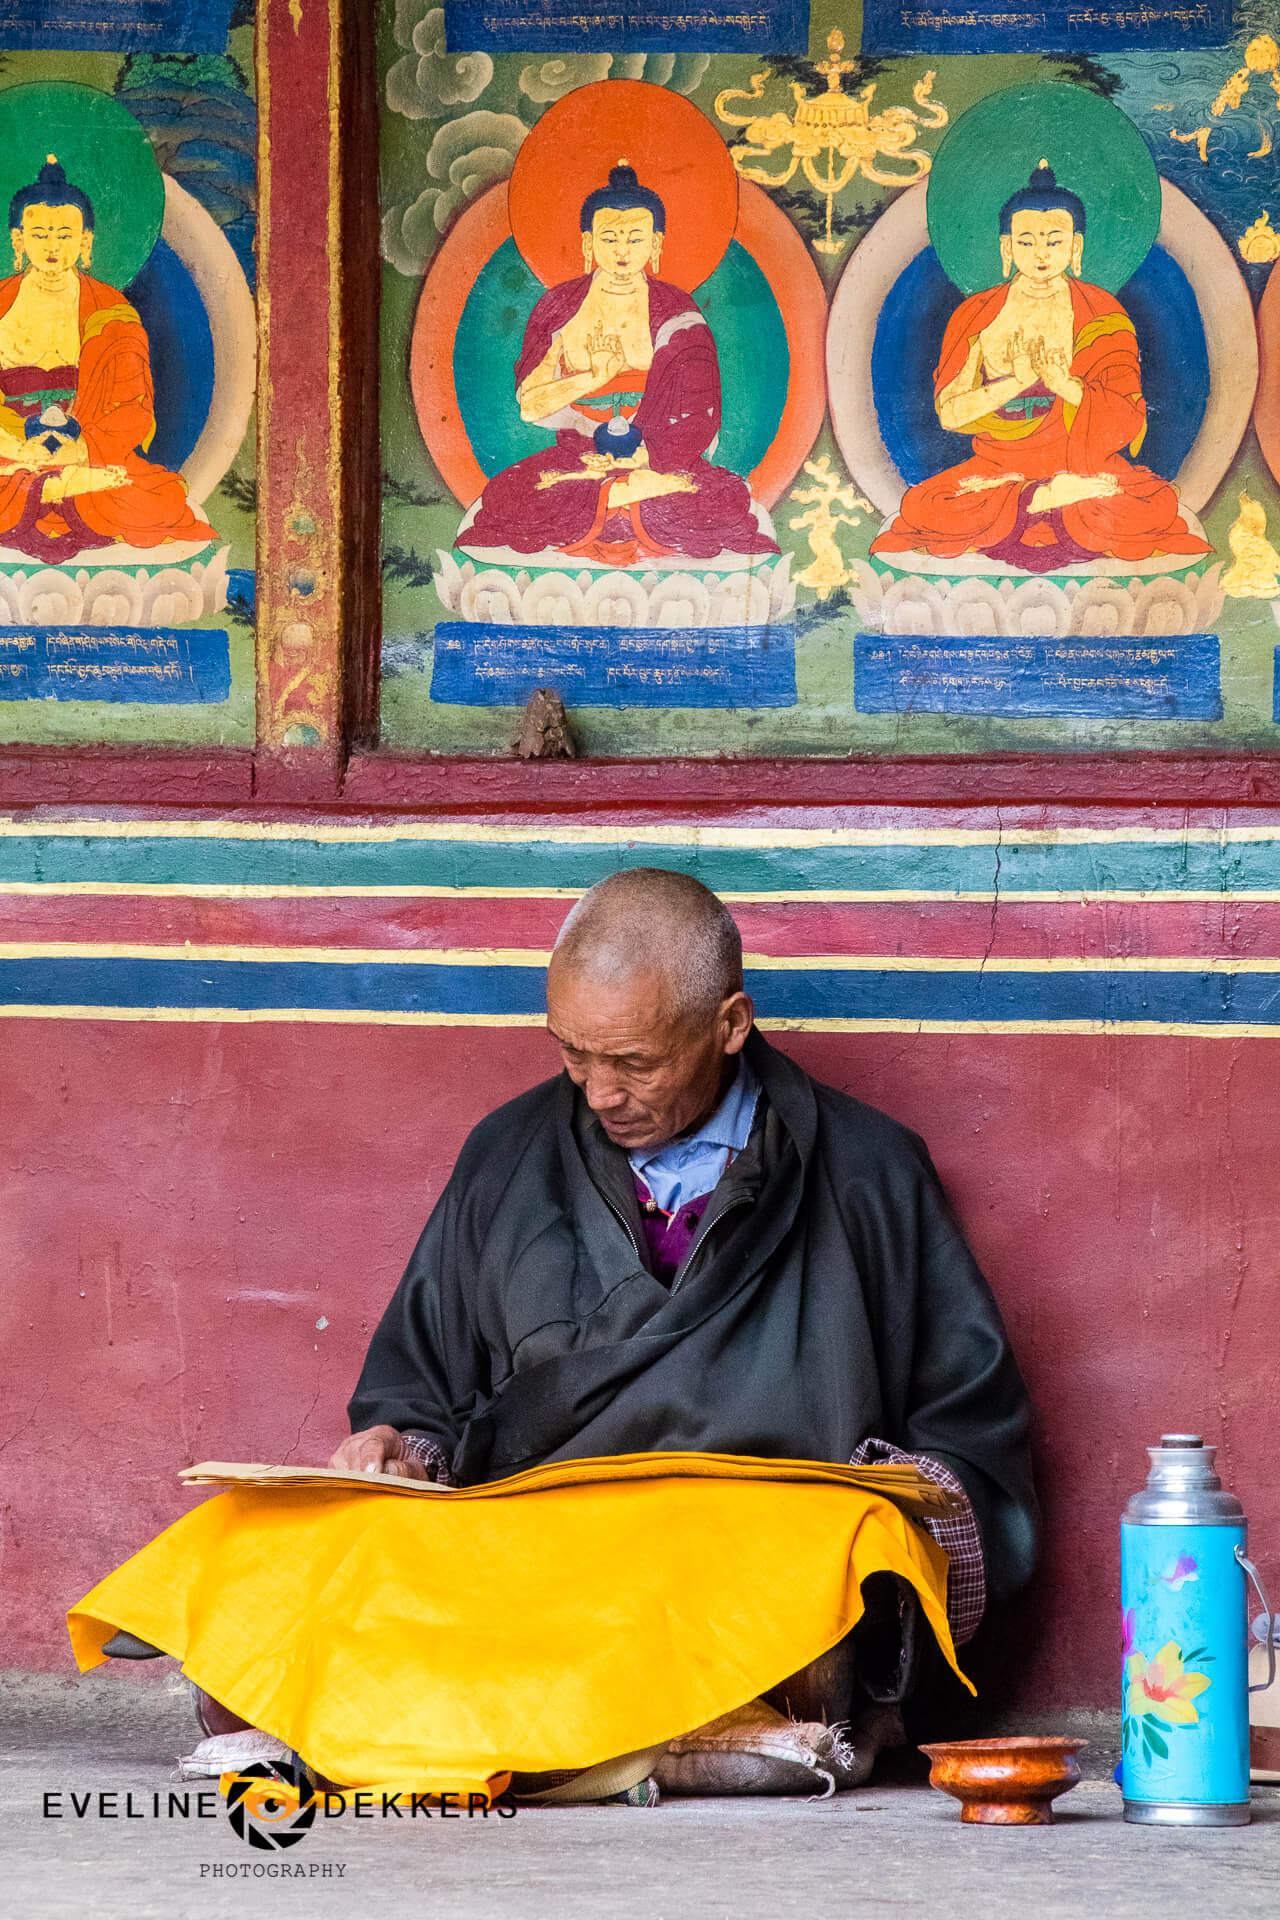 Monk at Tashi Lhunpo Monastery - Tibet